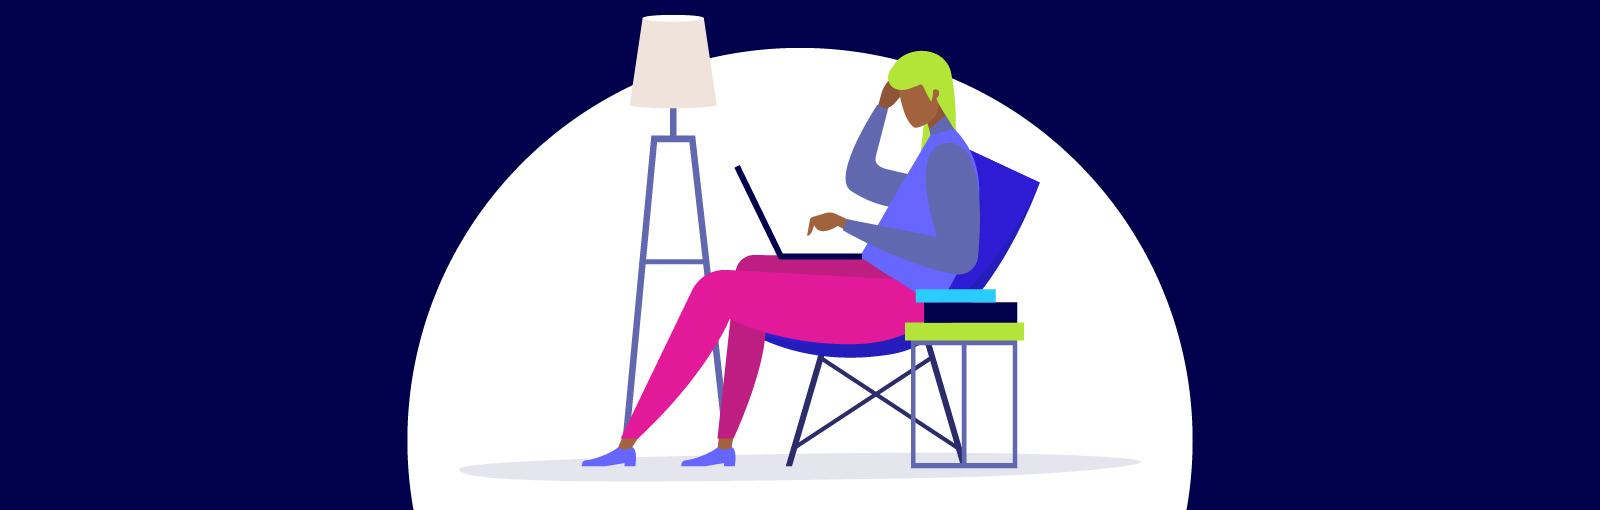 I'm a social media marketer — Here's how I avoid burnout